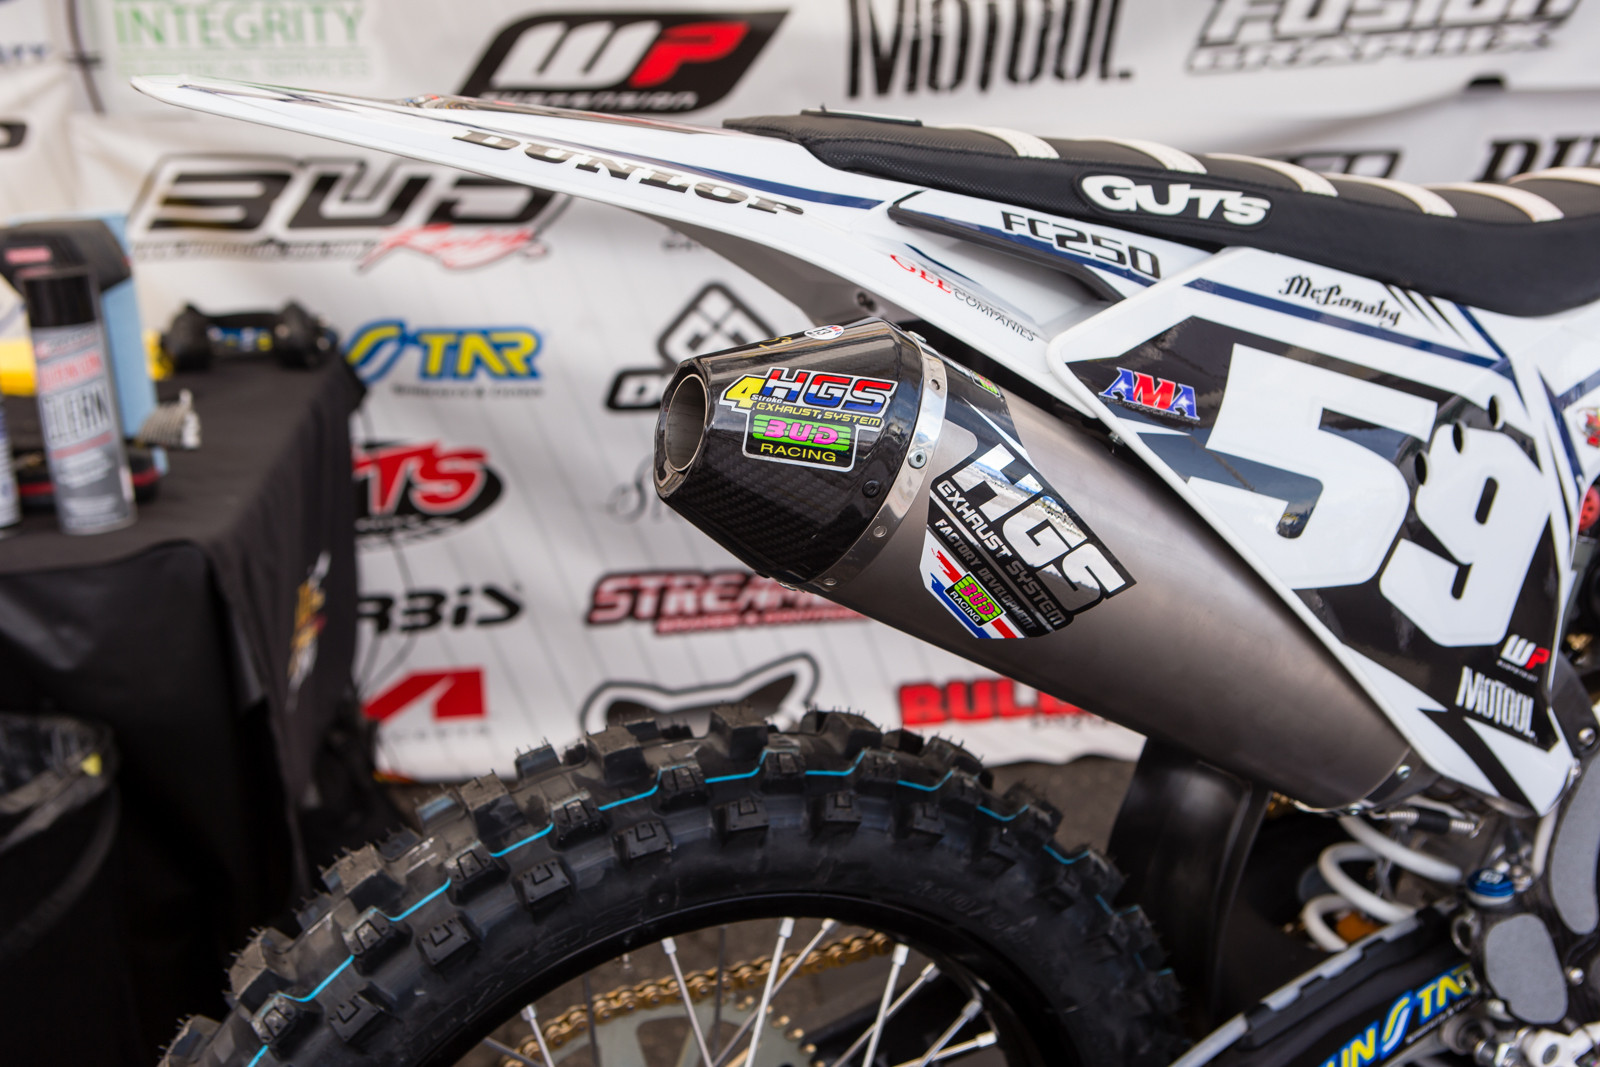 HGS Exhausts - Vital MX Pit Bits: Glendale - Motocross Pictures - Vital MX